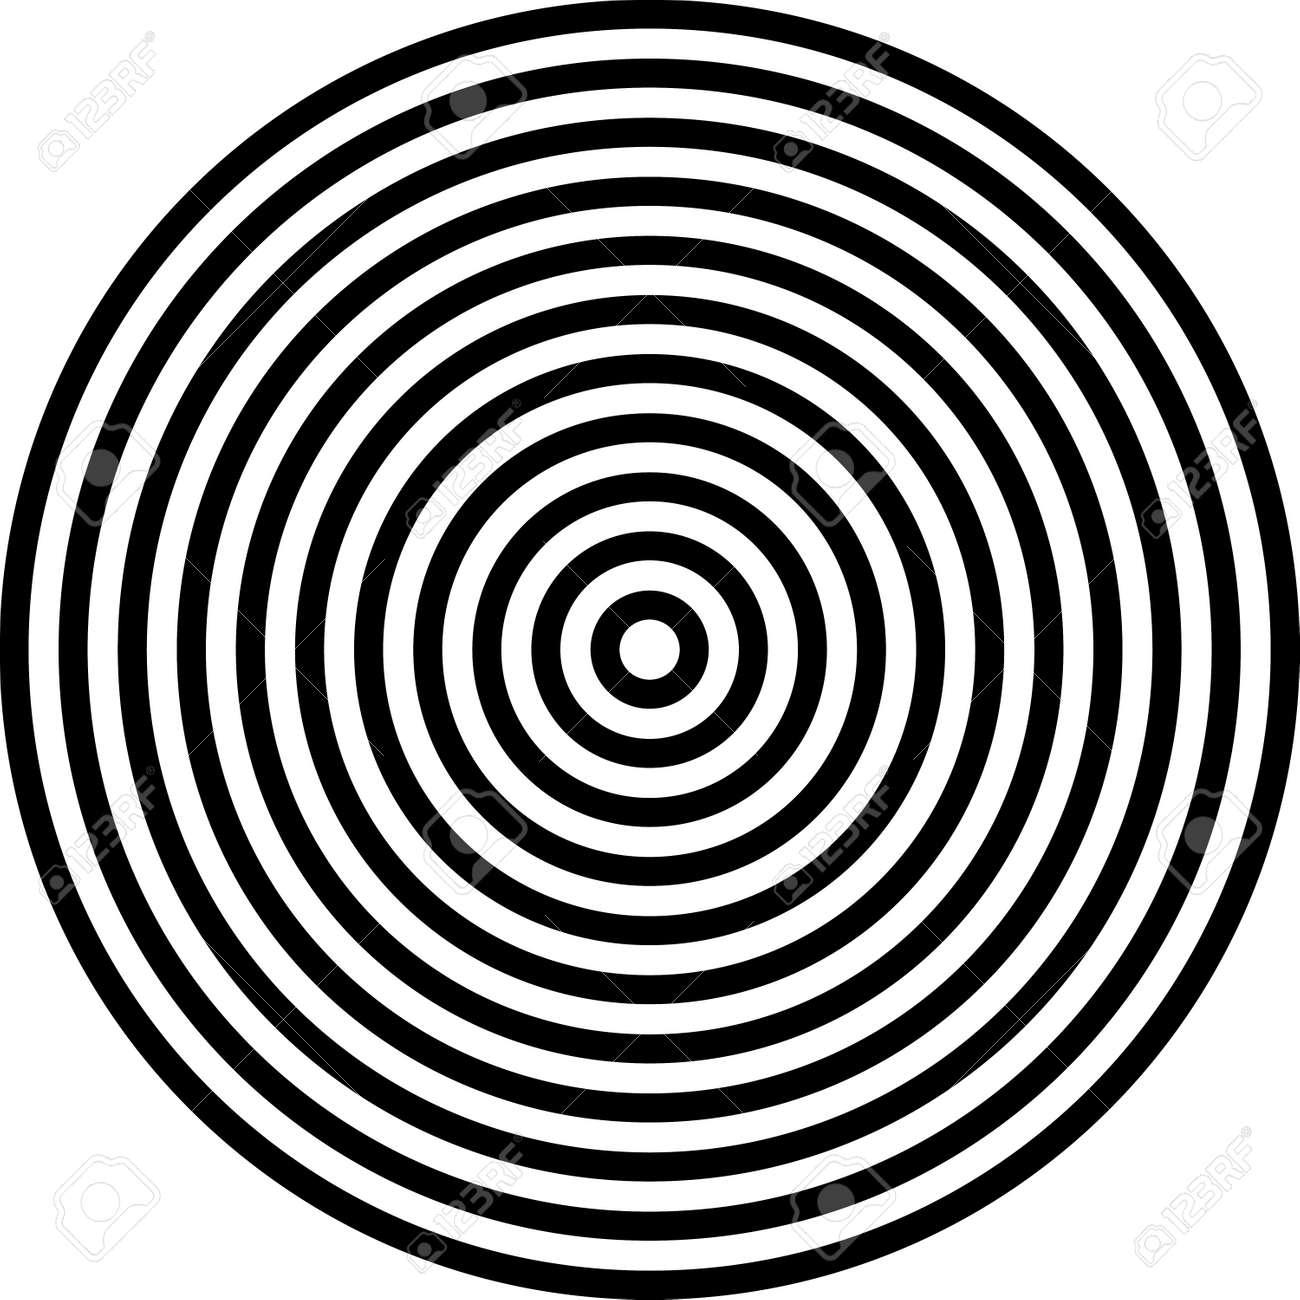 Clipart 3 concentric circles - ClipartFest